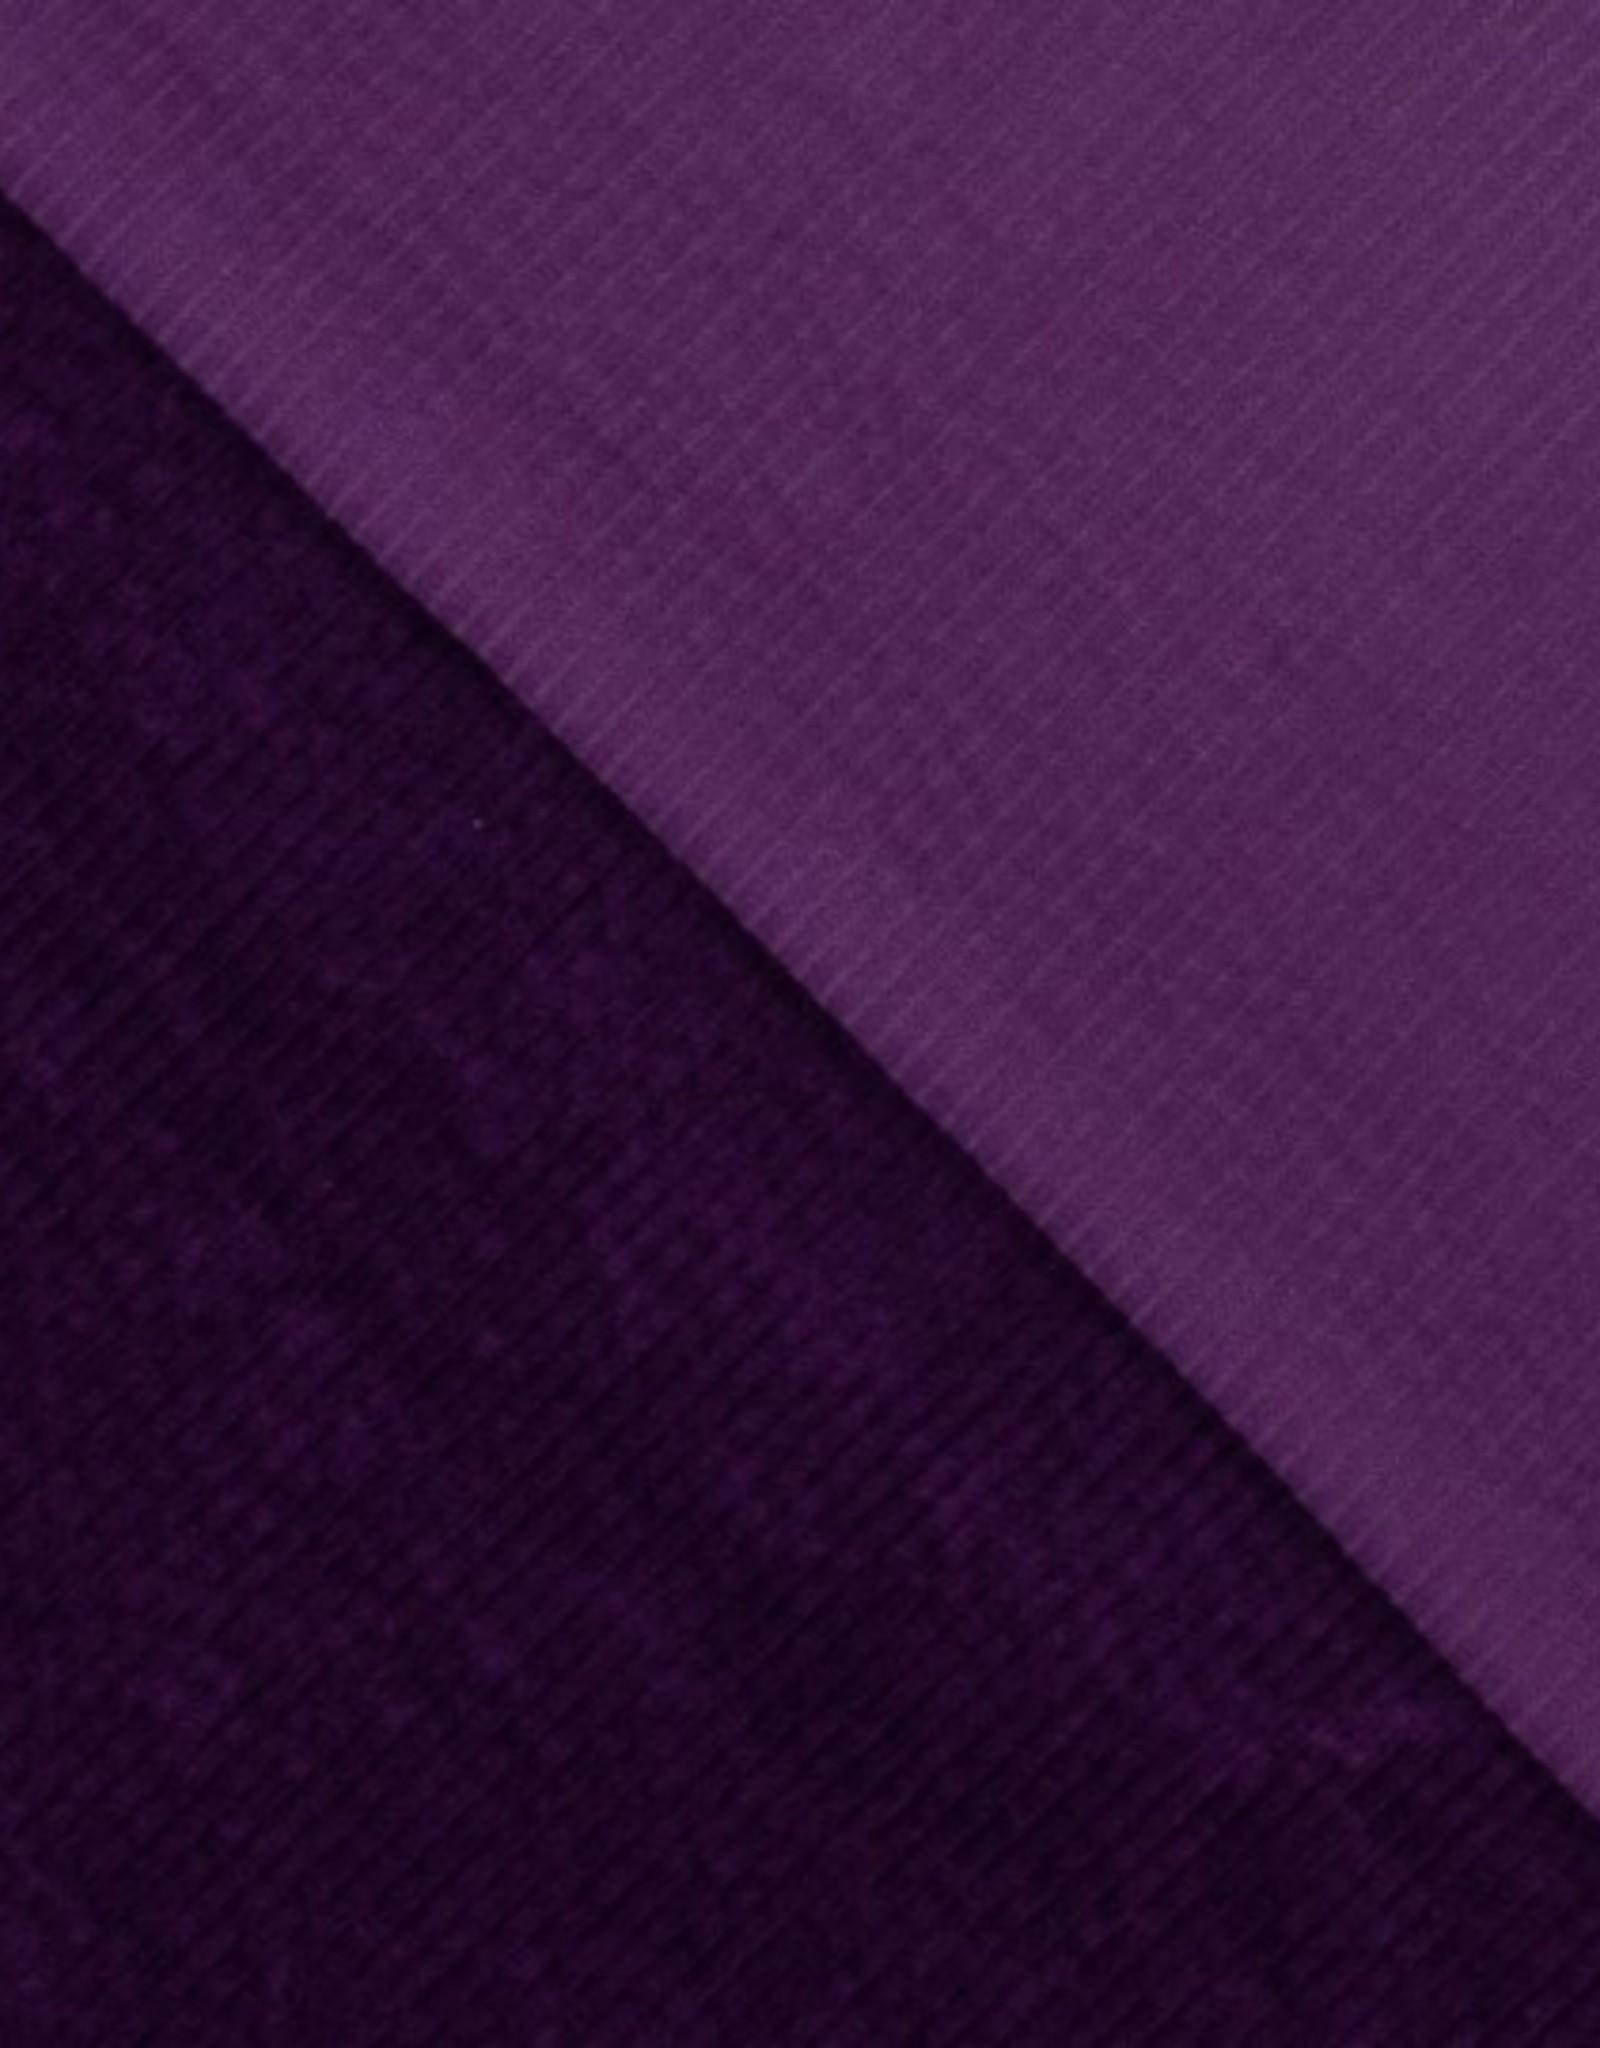 8w bubble wash corduroy imperial purple